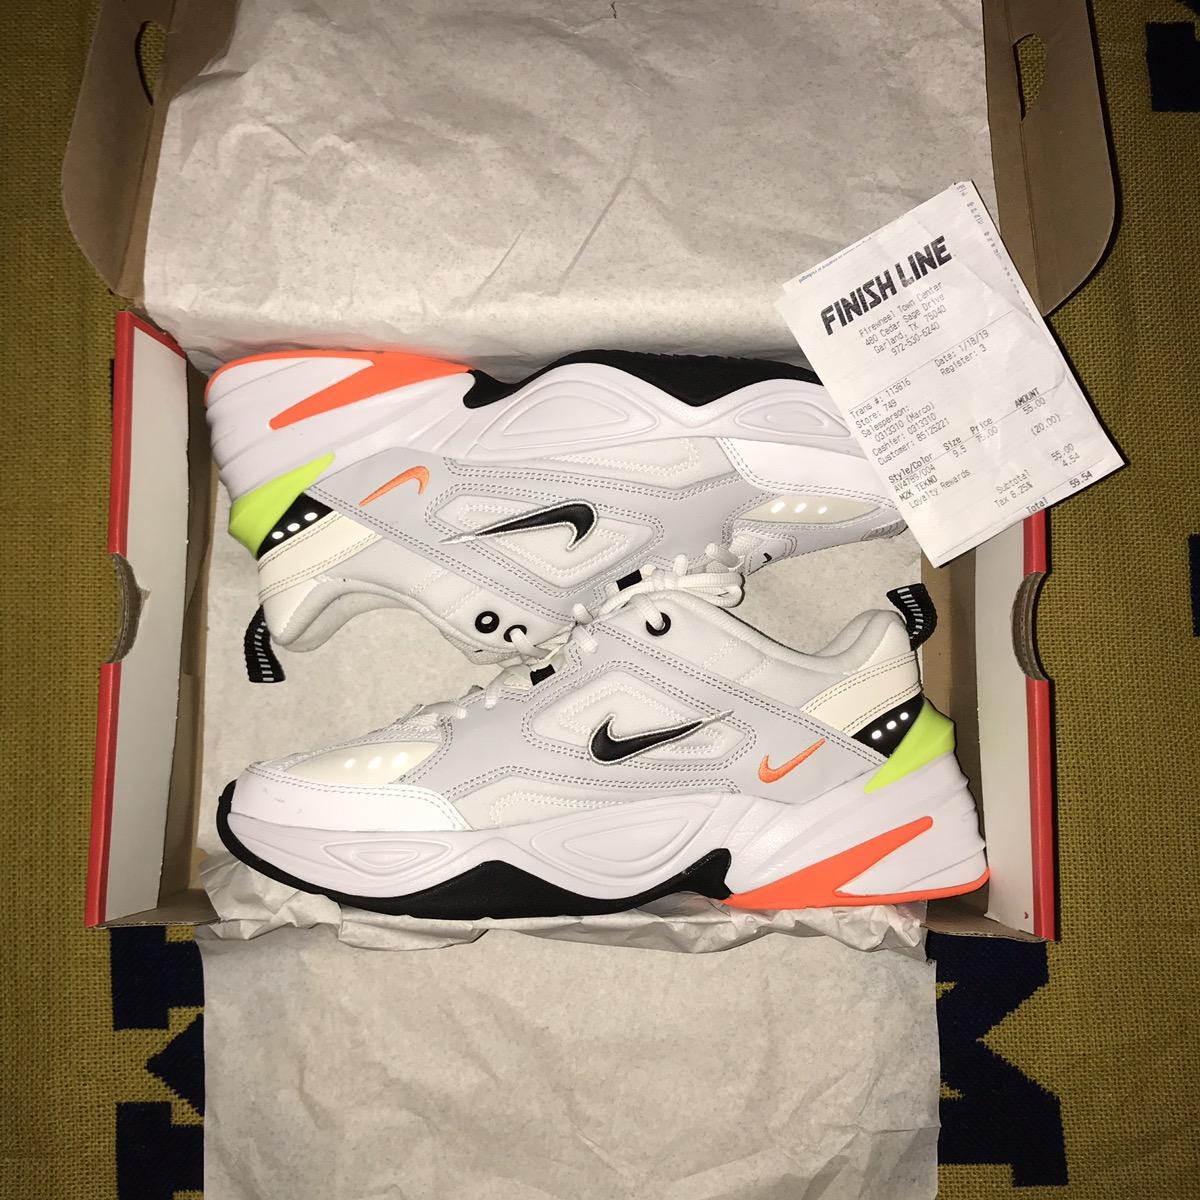 low cost 80af1 8ee14 Nike Nike M2k Tekno Mens (pure Platinum black sail white) final    Grailed